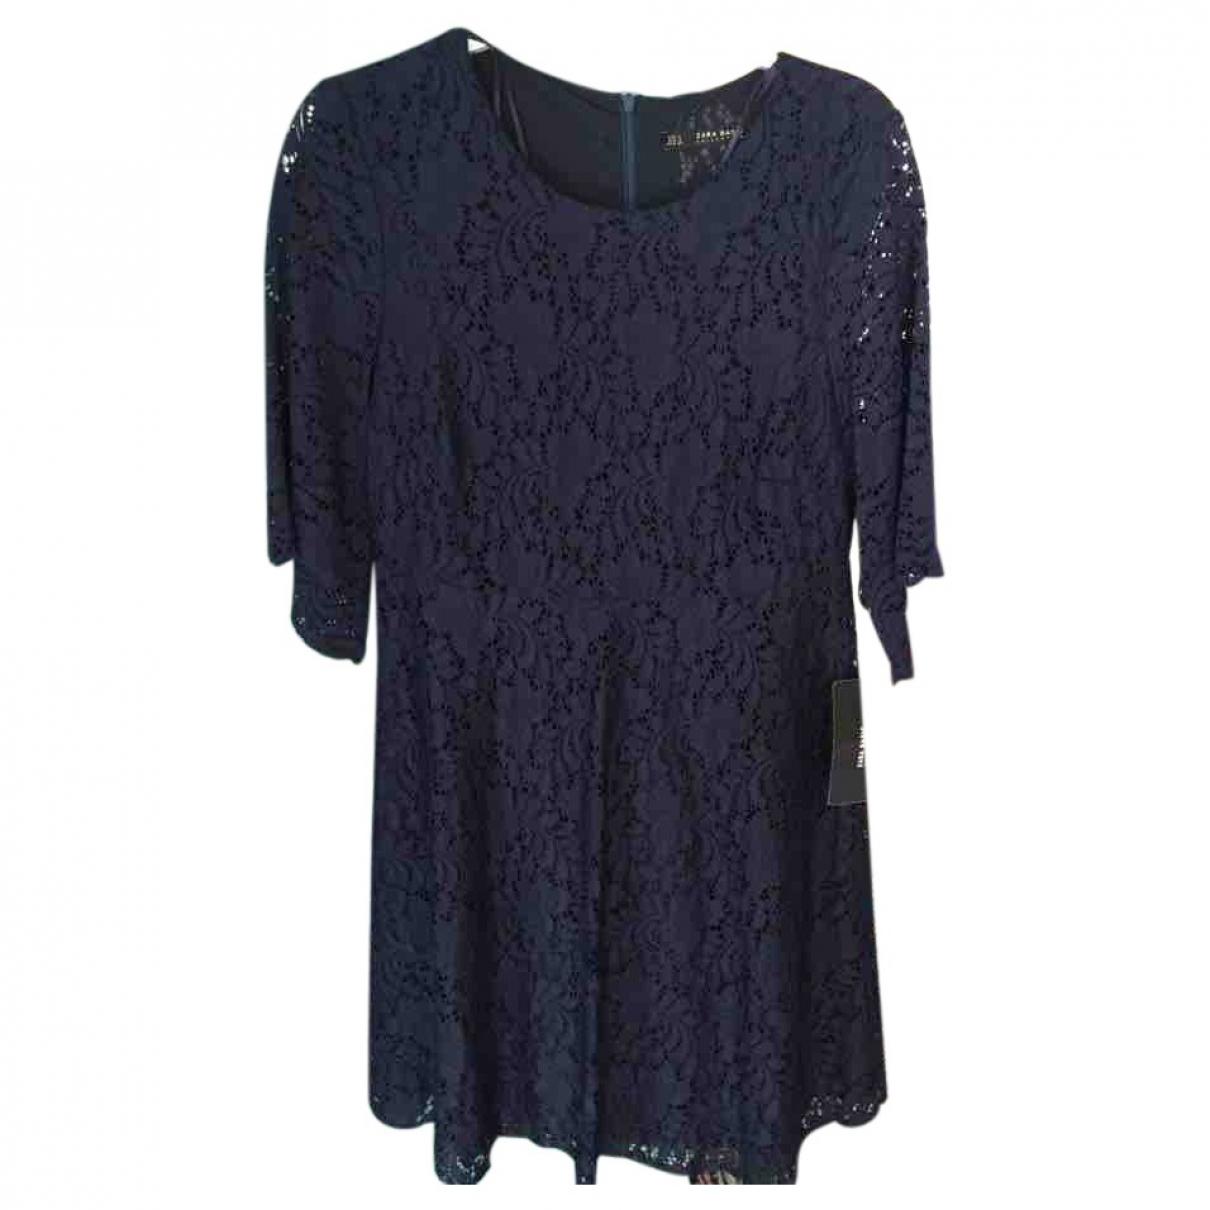 Zara - Robe   pour femme en dentelle - bleu